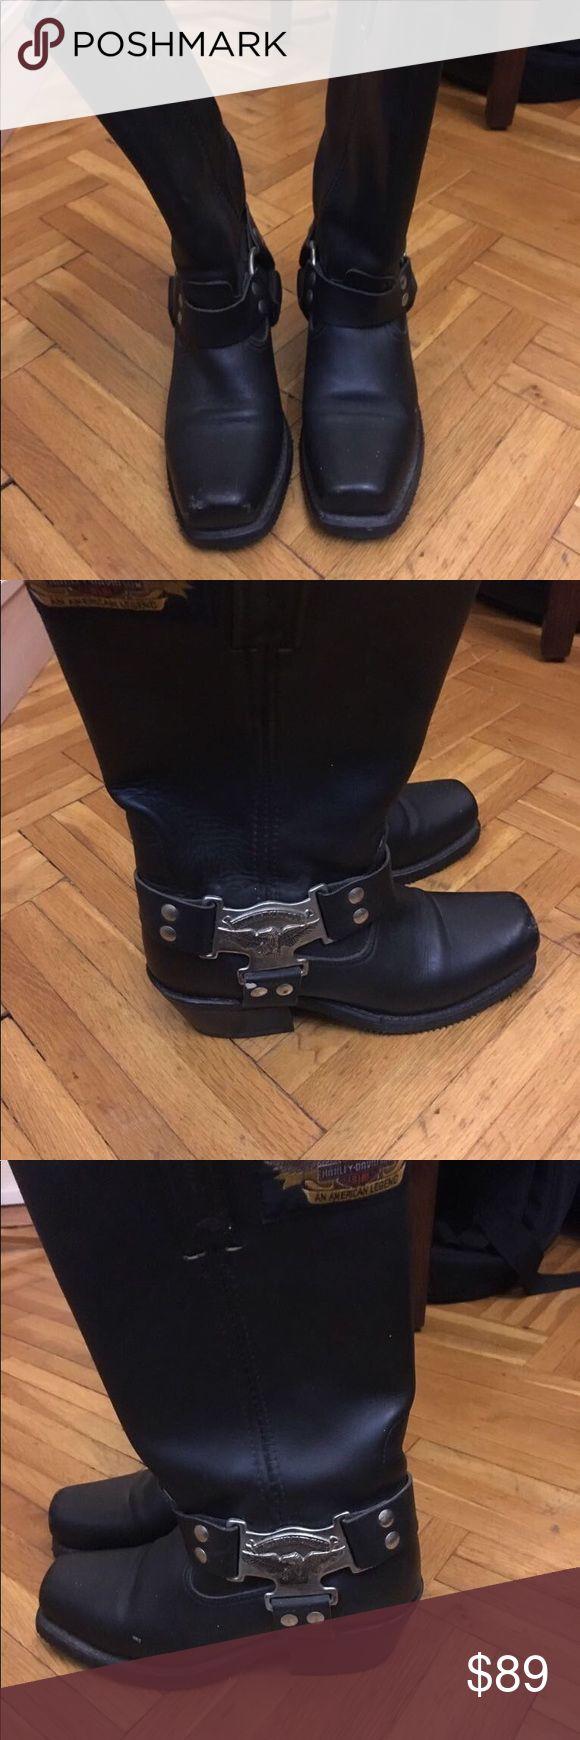 Vintage Harley Davidson Boots İn very good condition worn only once Harley-Davidson Shoes #harleydavidsonboots